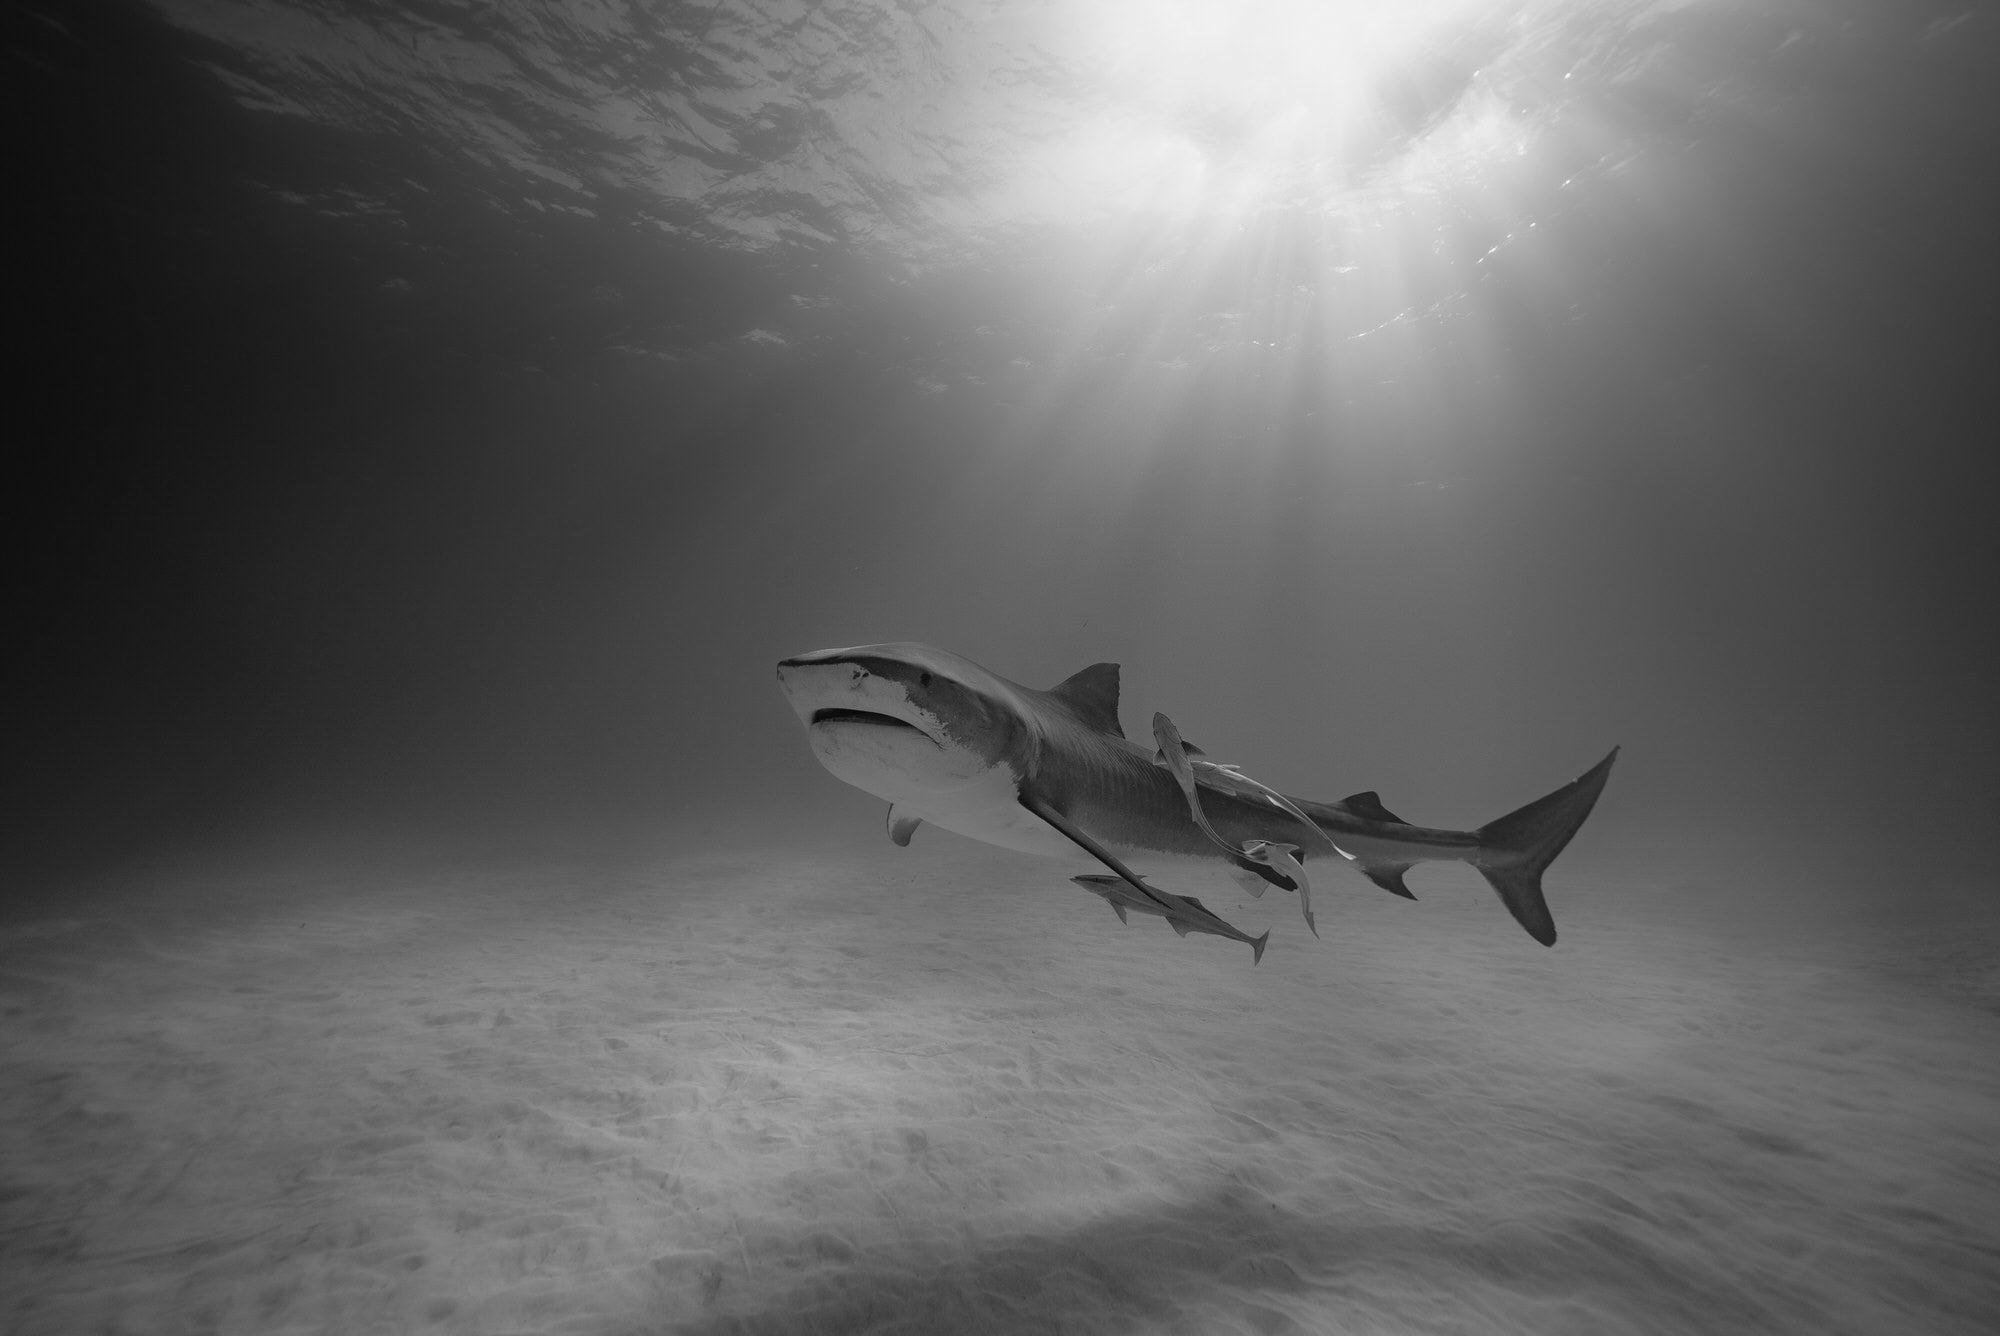 Alpha-Universe-SeaLegacy-Photo-by-Paul-Nicklen-DSC06440_3000LE.jpg